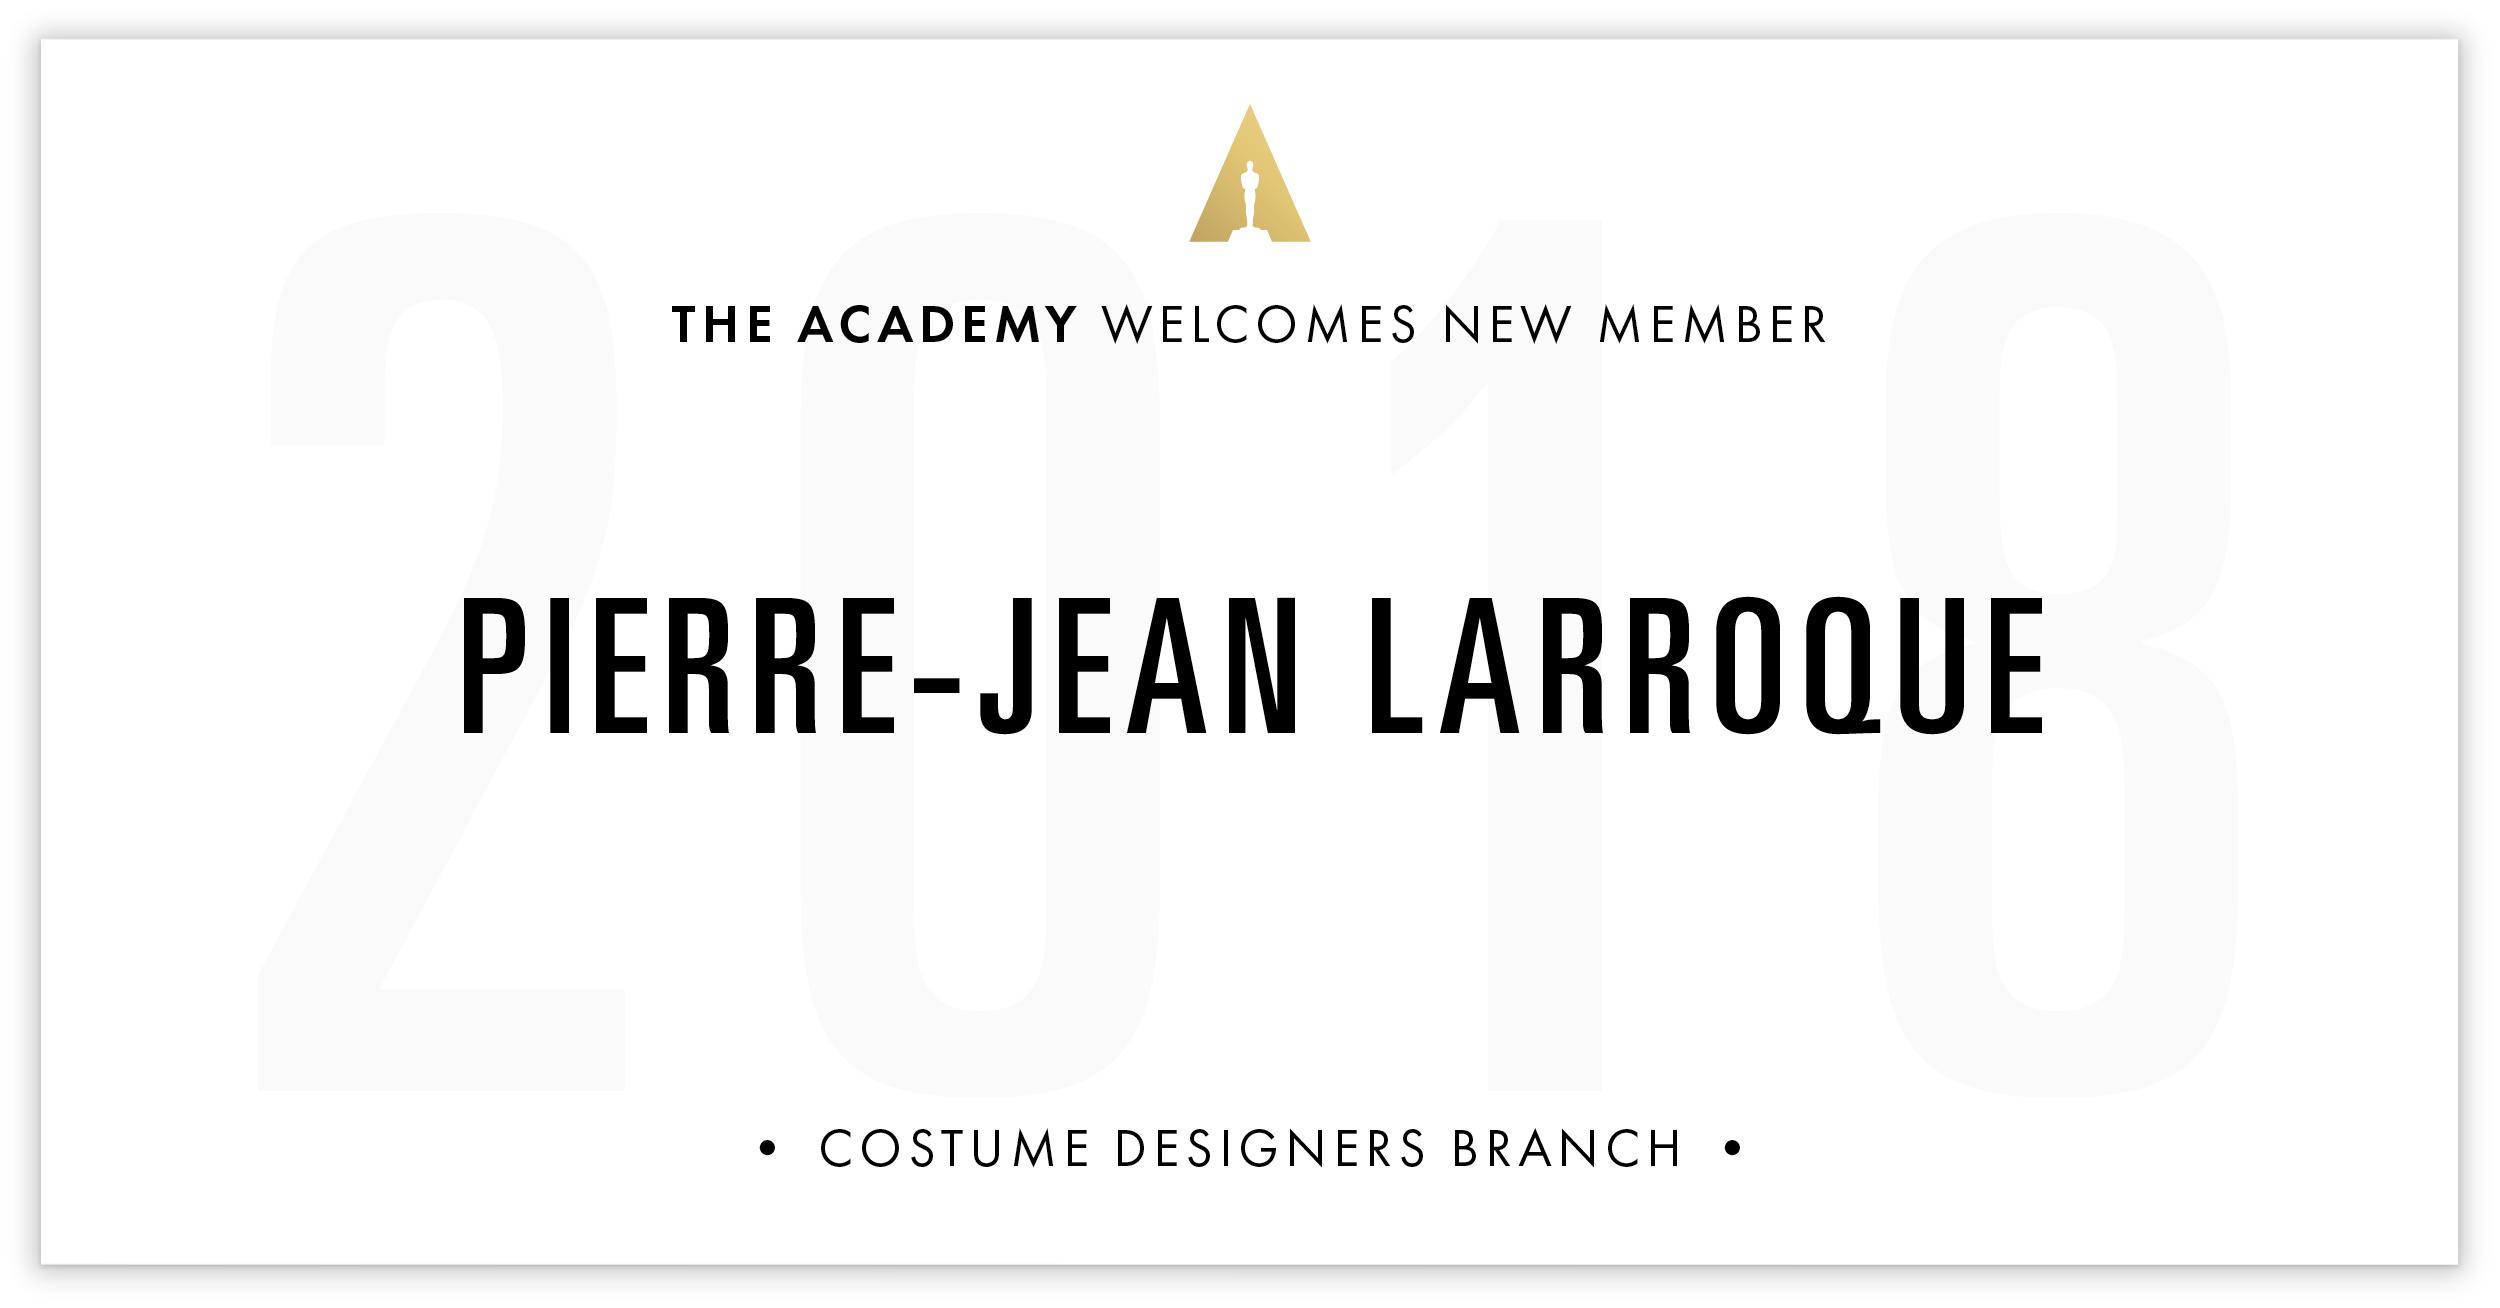 Pierre-Jean Larroque is invited!